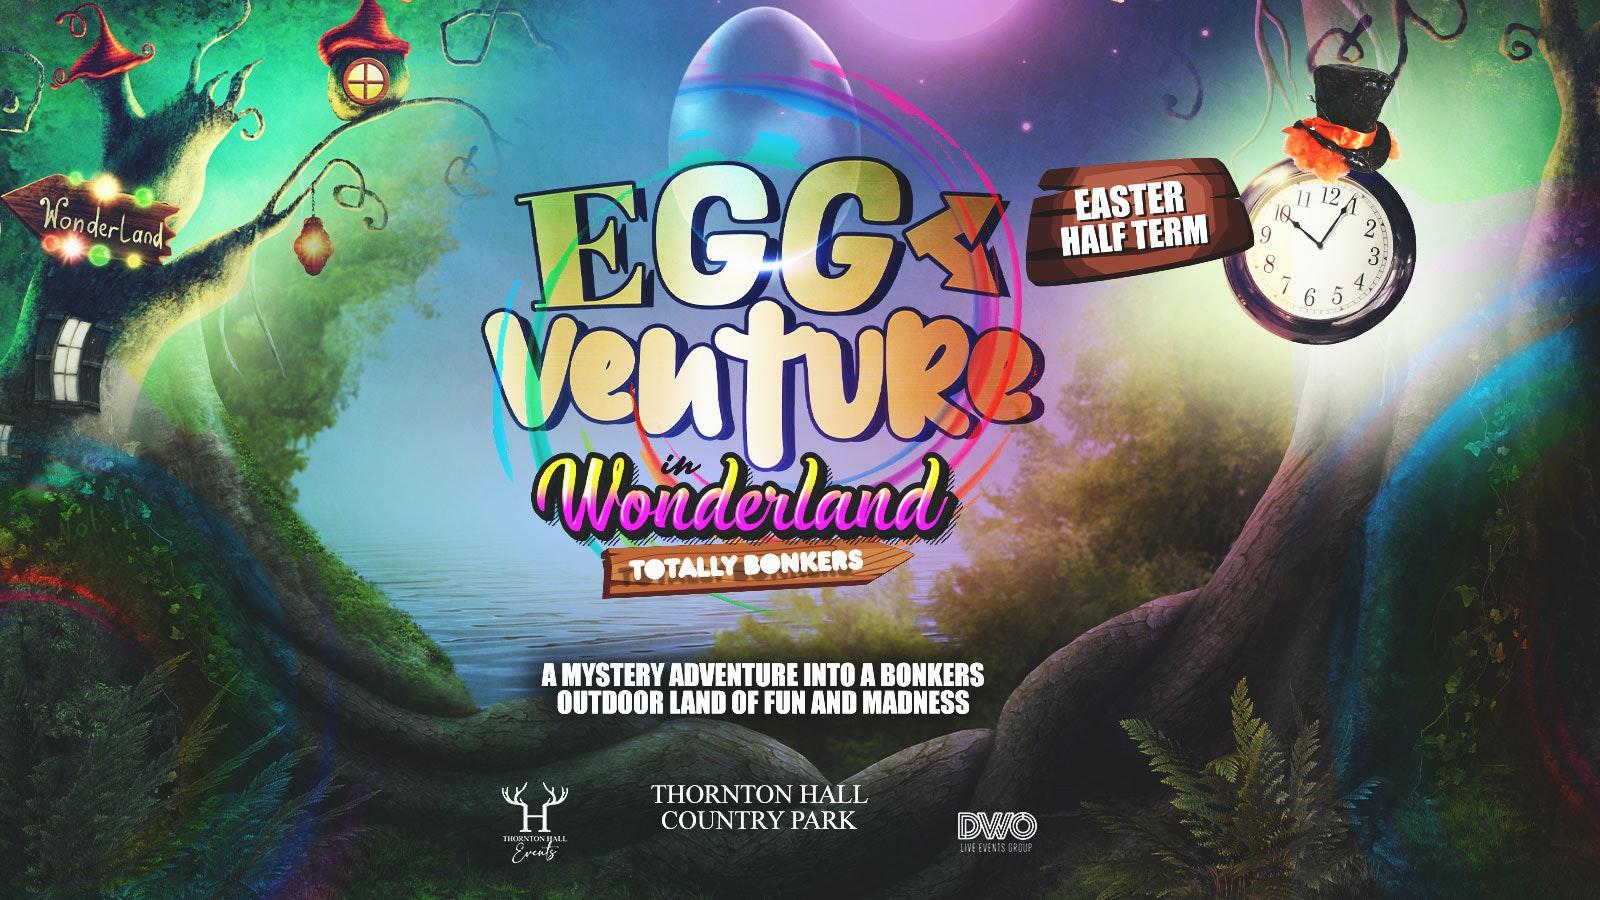 EggVenture in Wonderland – Wednesday 7th April – 2pm